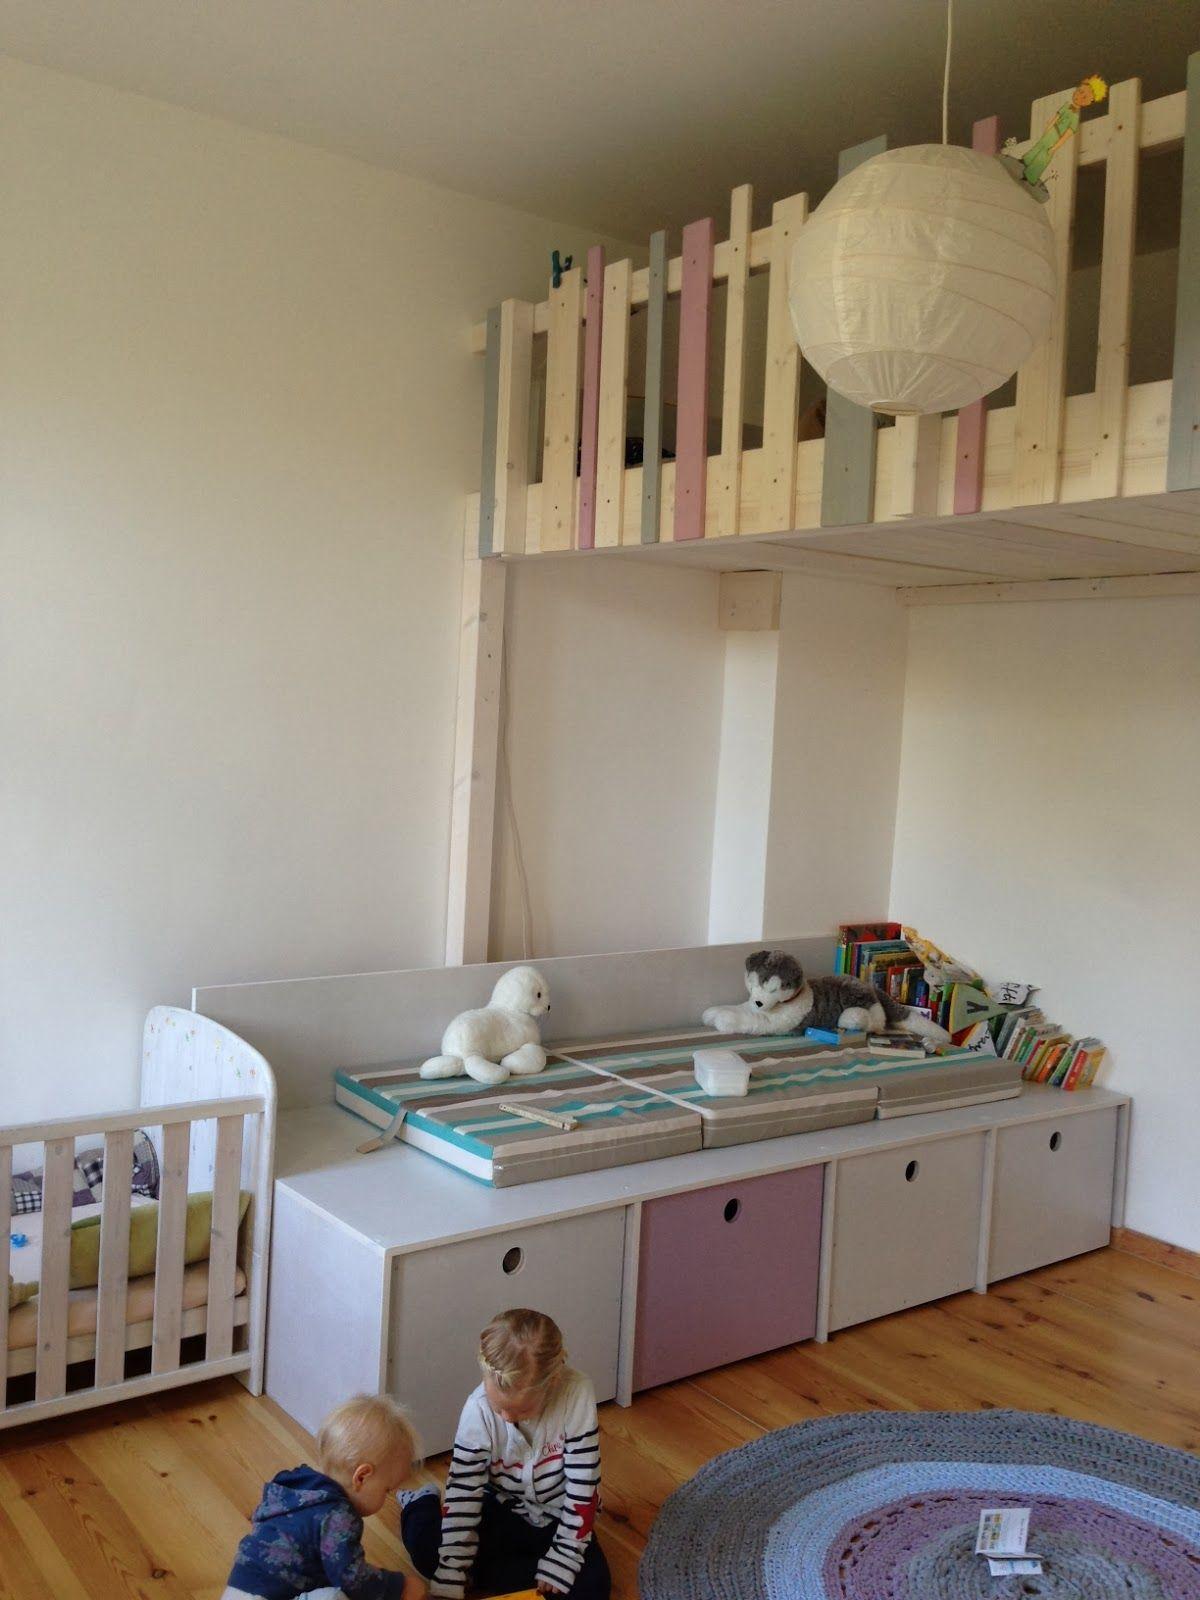 cama luna hochbett hochebene galerie nach ma ideas 4. Black Bedroom Furniture Sets. Home Design Ideas